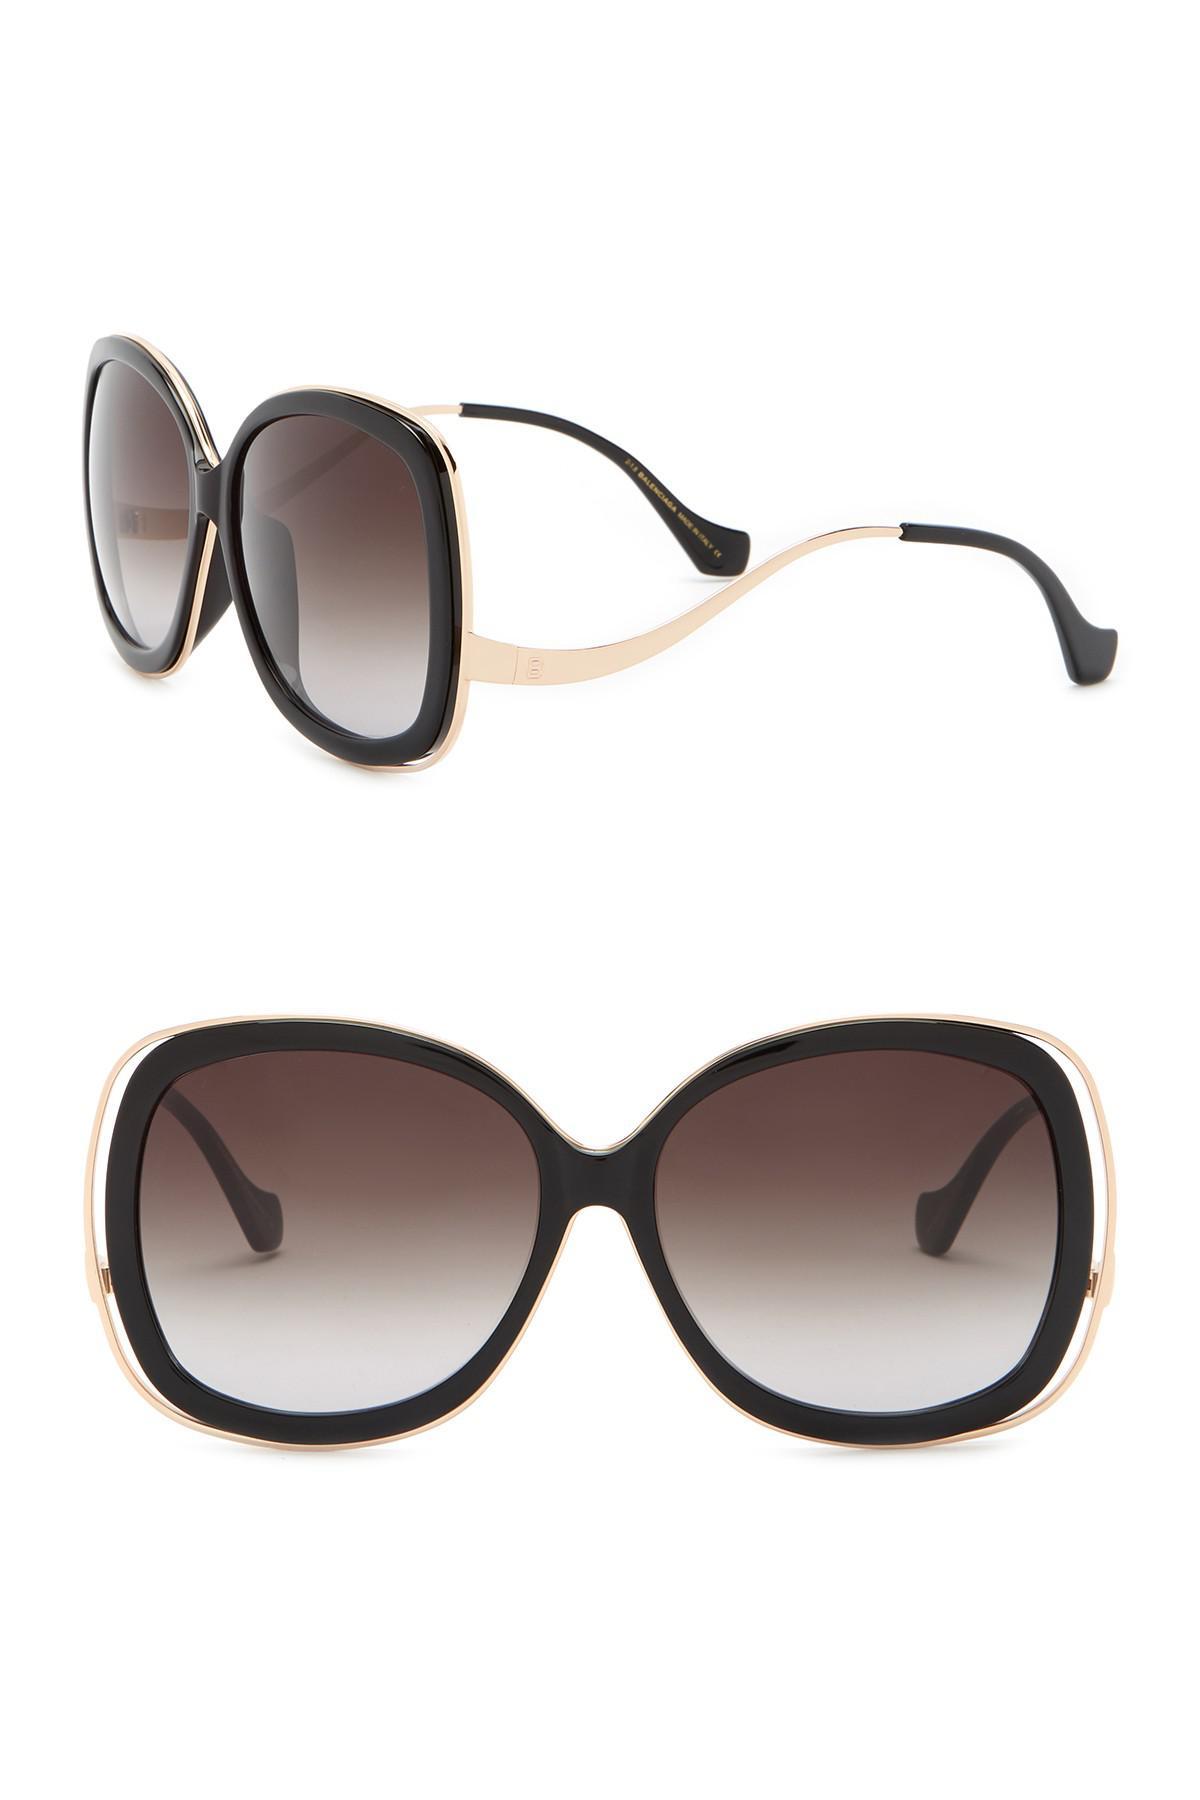 35856fa2ab Balenciaga 61mm Oversized Sunglasses in Brown - Lyst